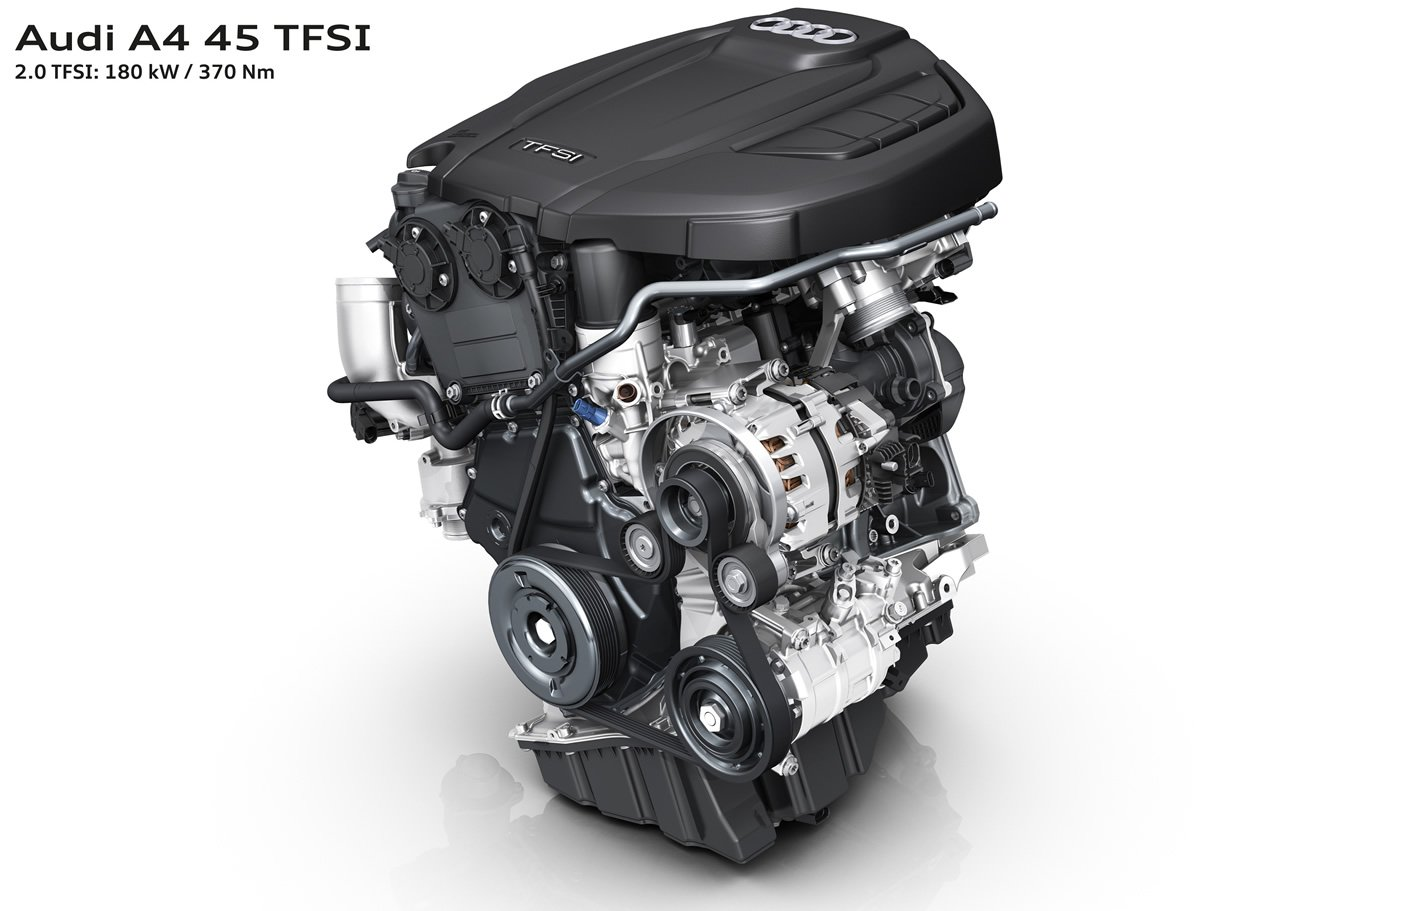 Audi A4 allroad quattro 45 TFSI S tronic z Mild Hybrid